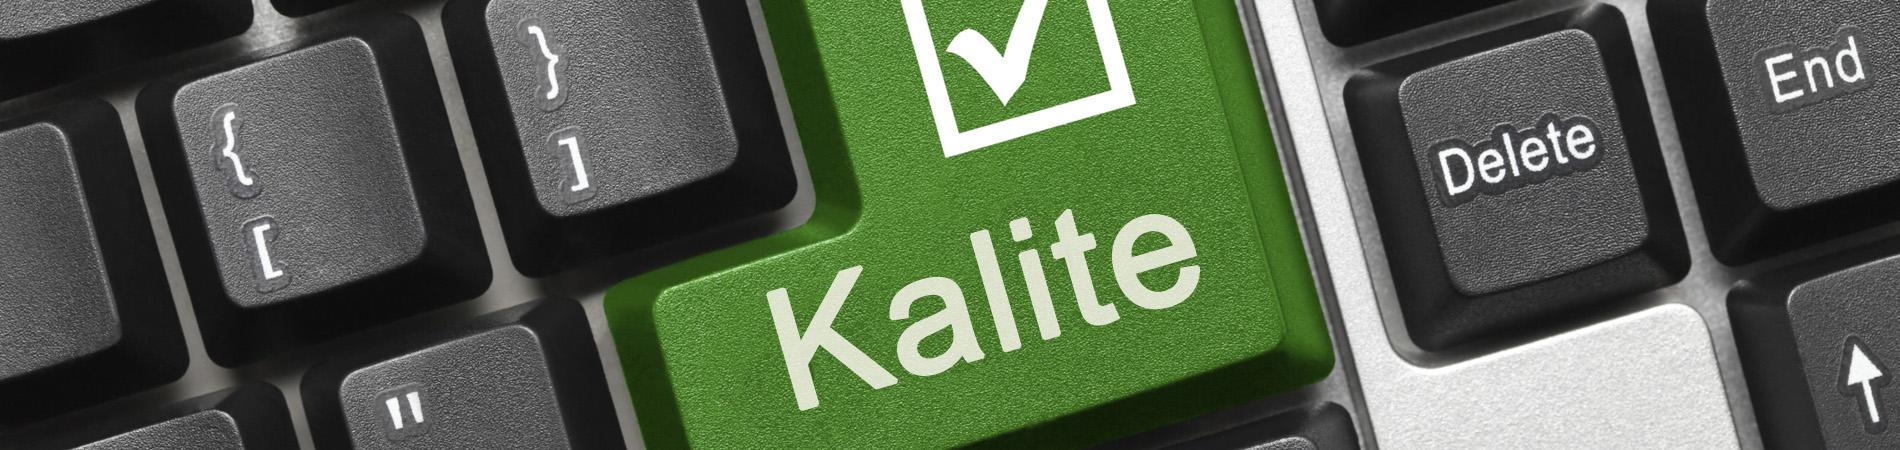 kalite1